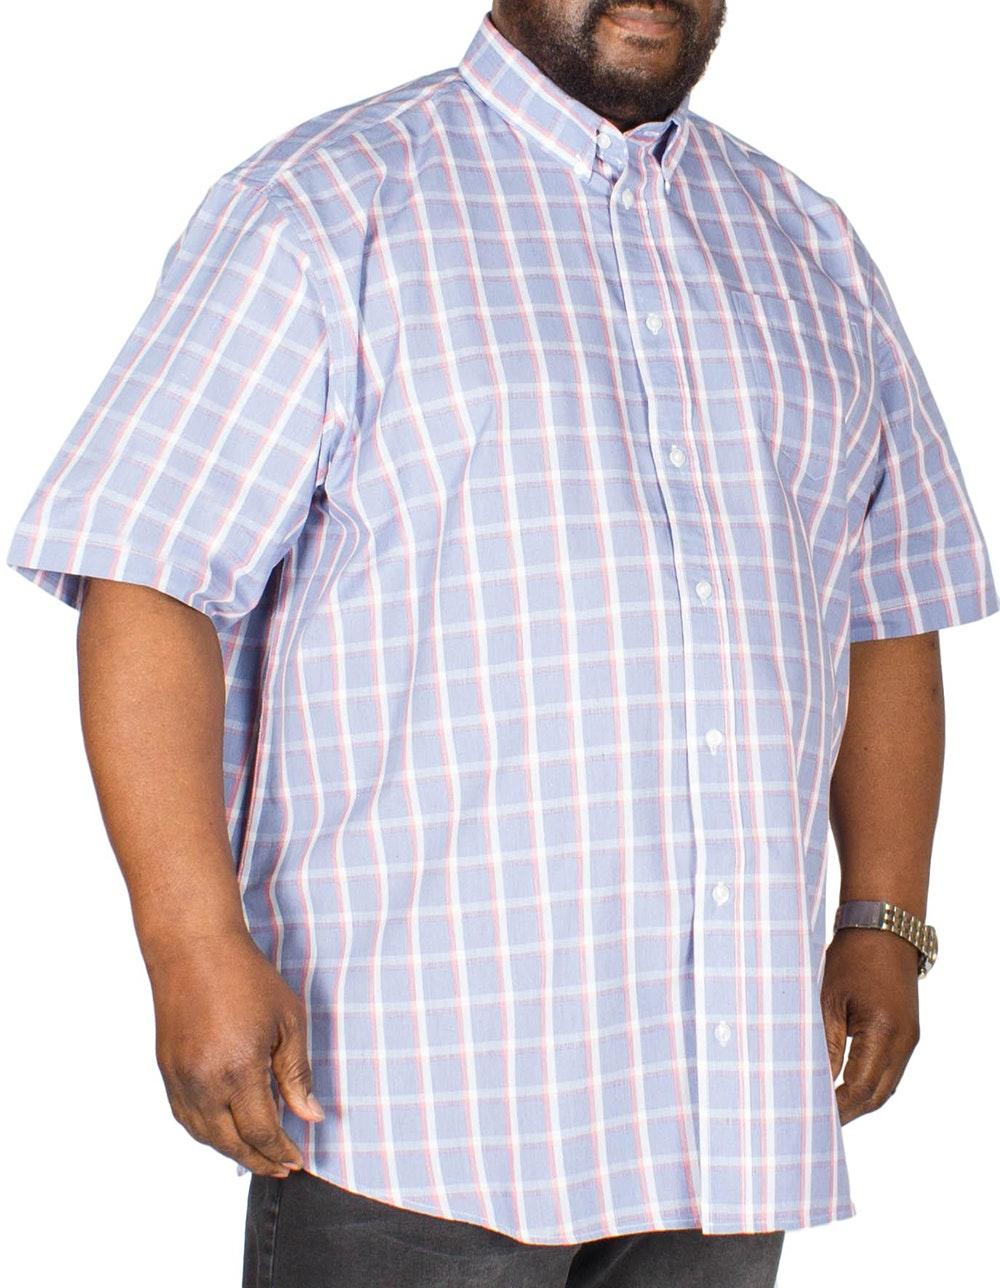 Carabou Check Shirt Blue